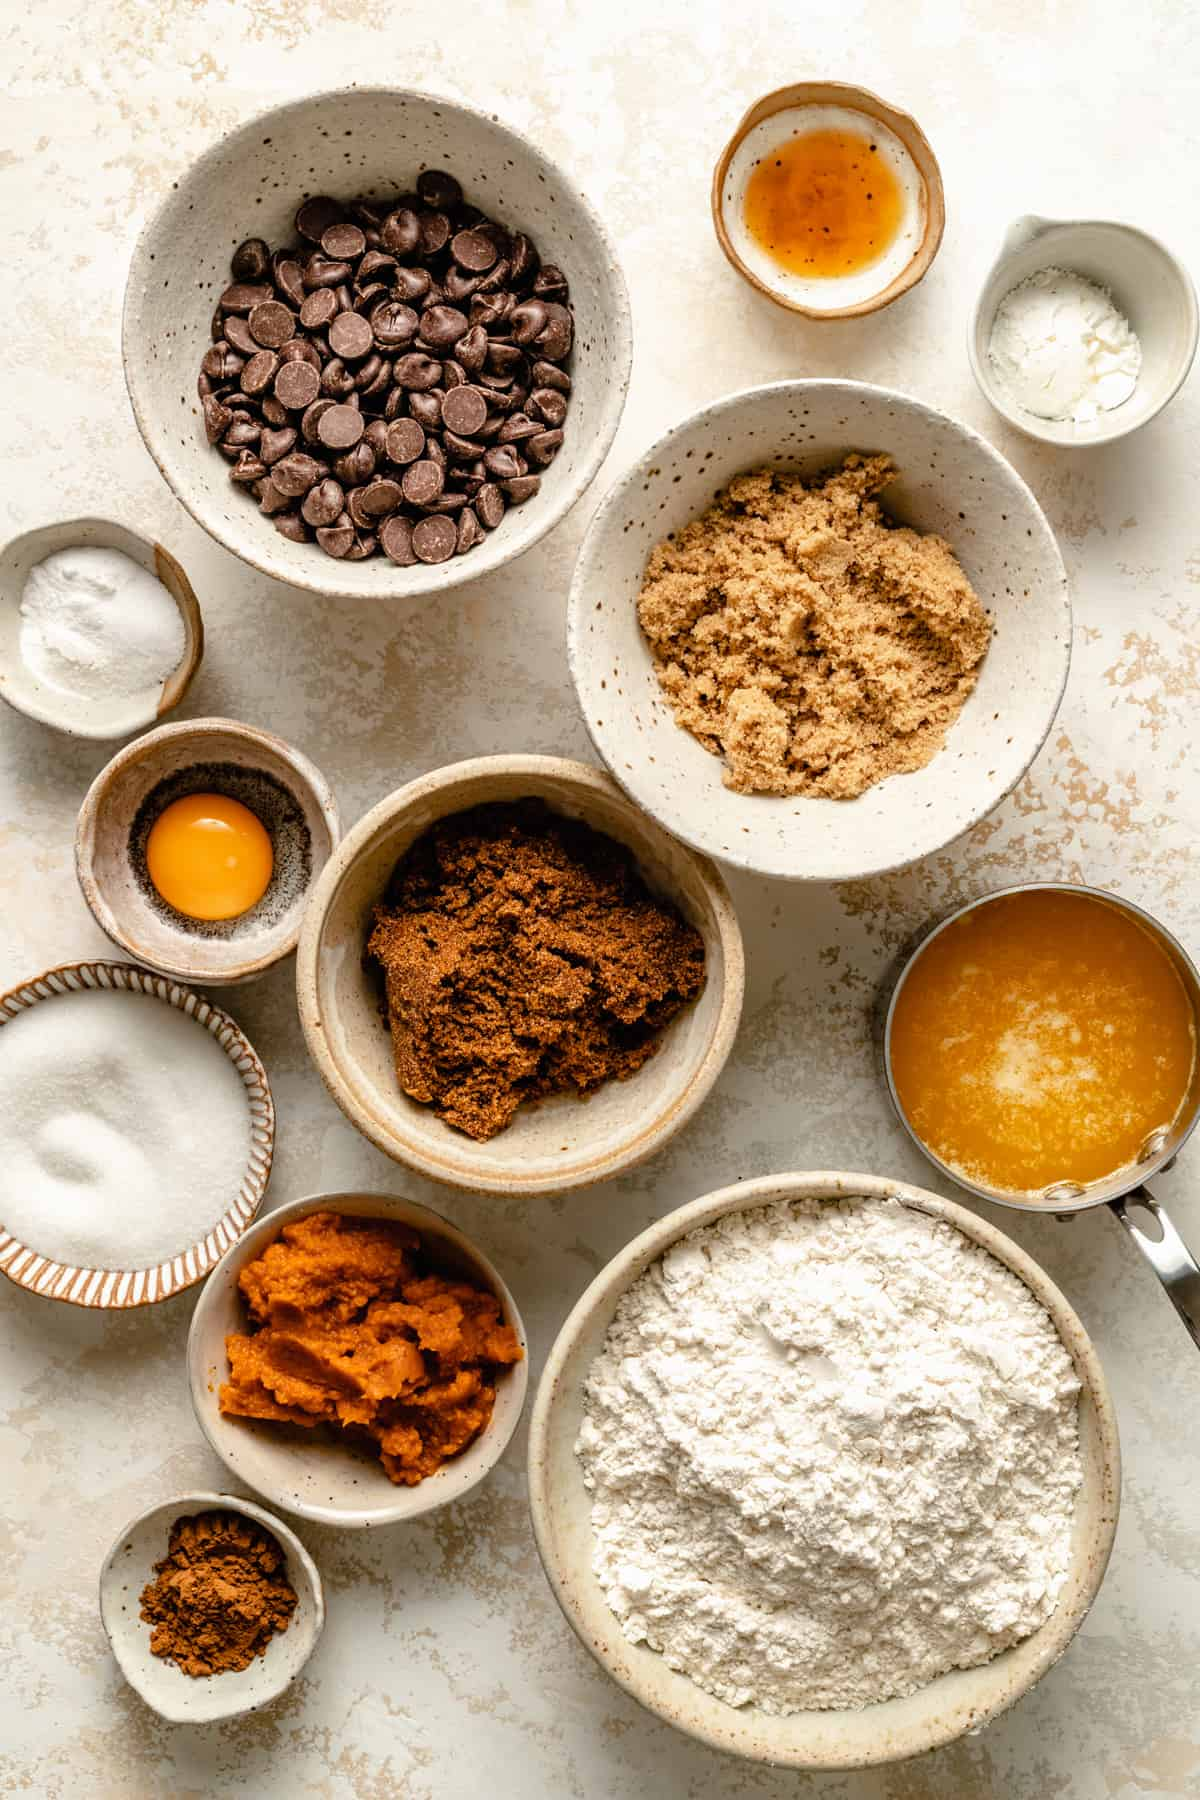 Ingredients in bowls: chocolate chips, pumpkin puree, melted butter, sugar, flour, baking powder & soda, pumpkin spice.